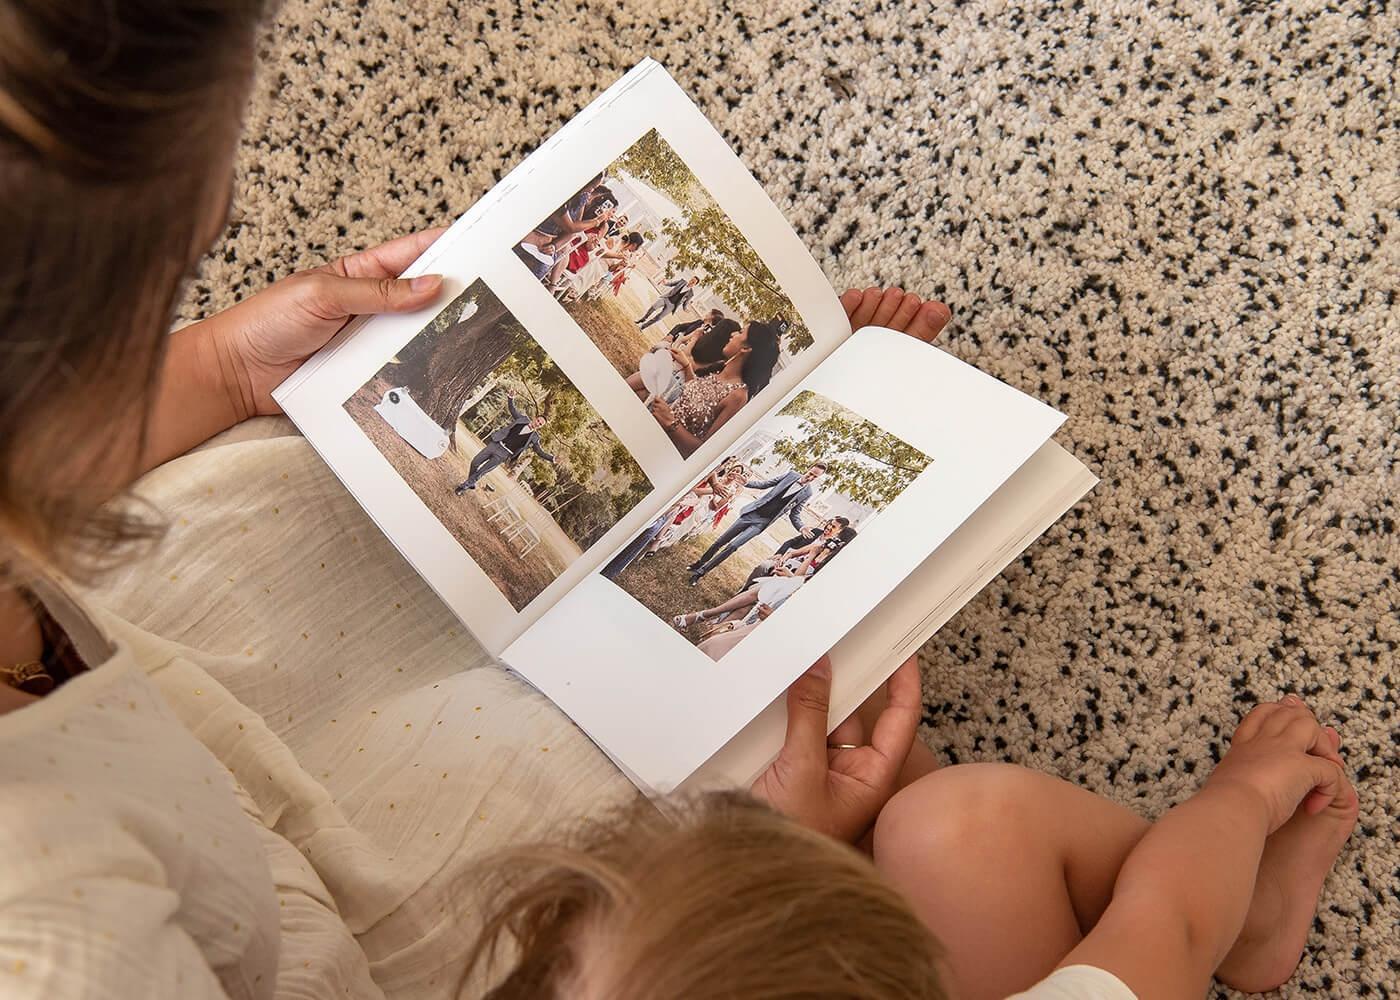 Innocence - Souvenirs - Impression album photo